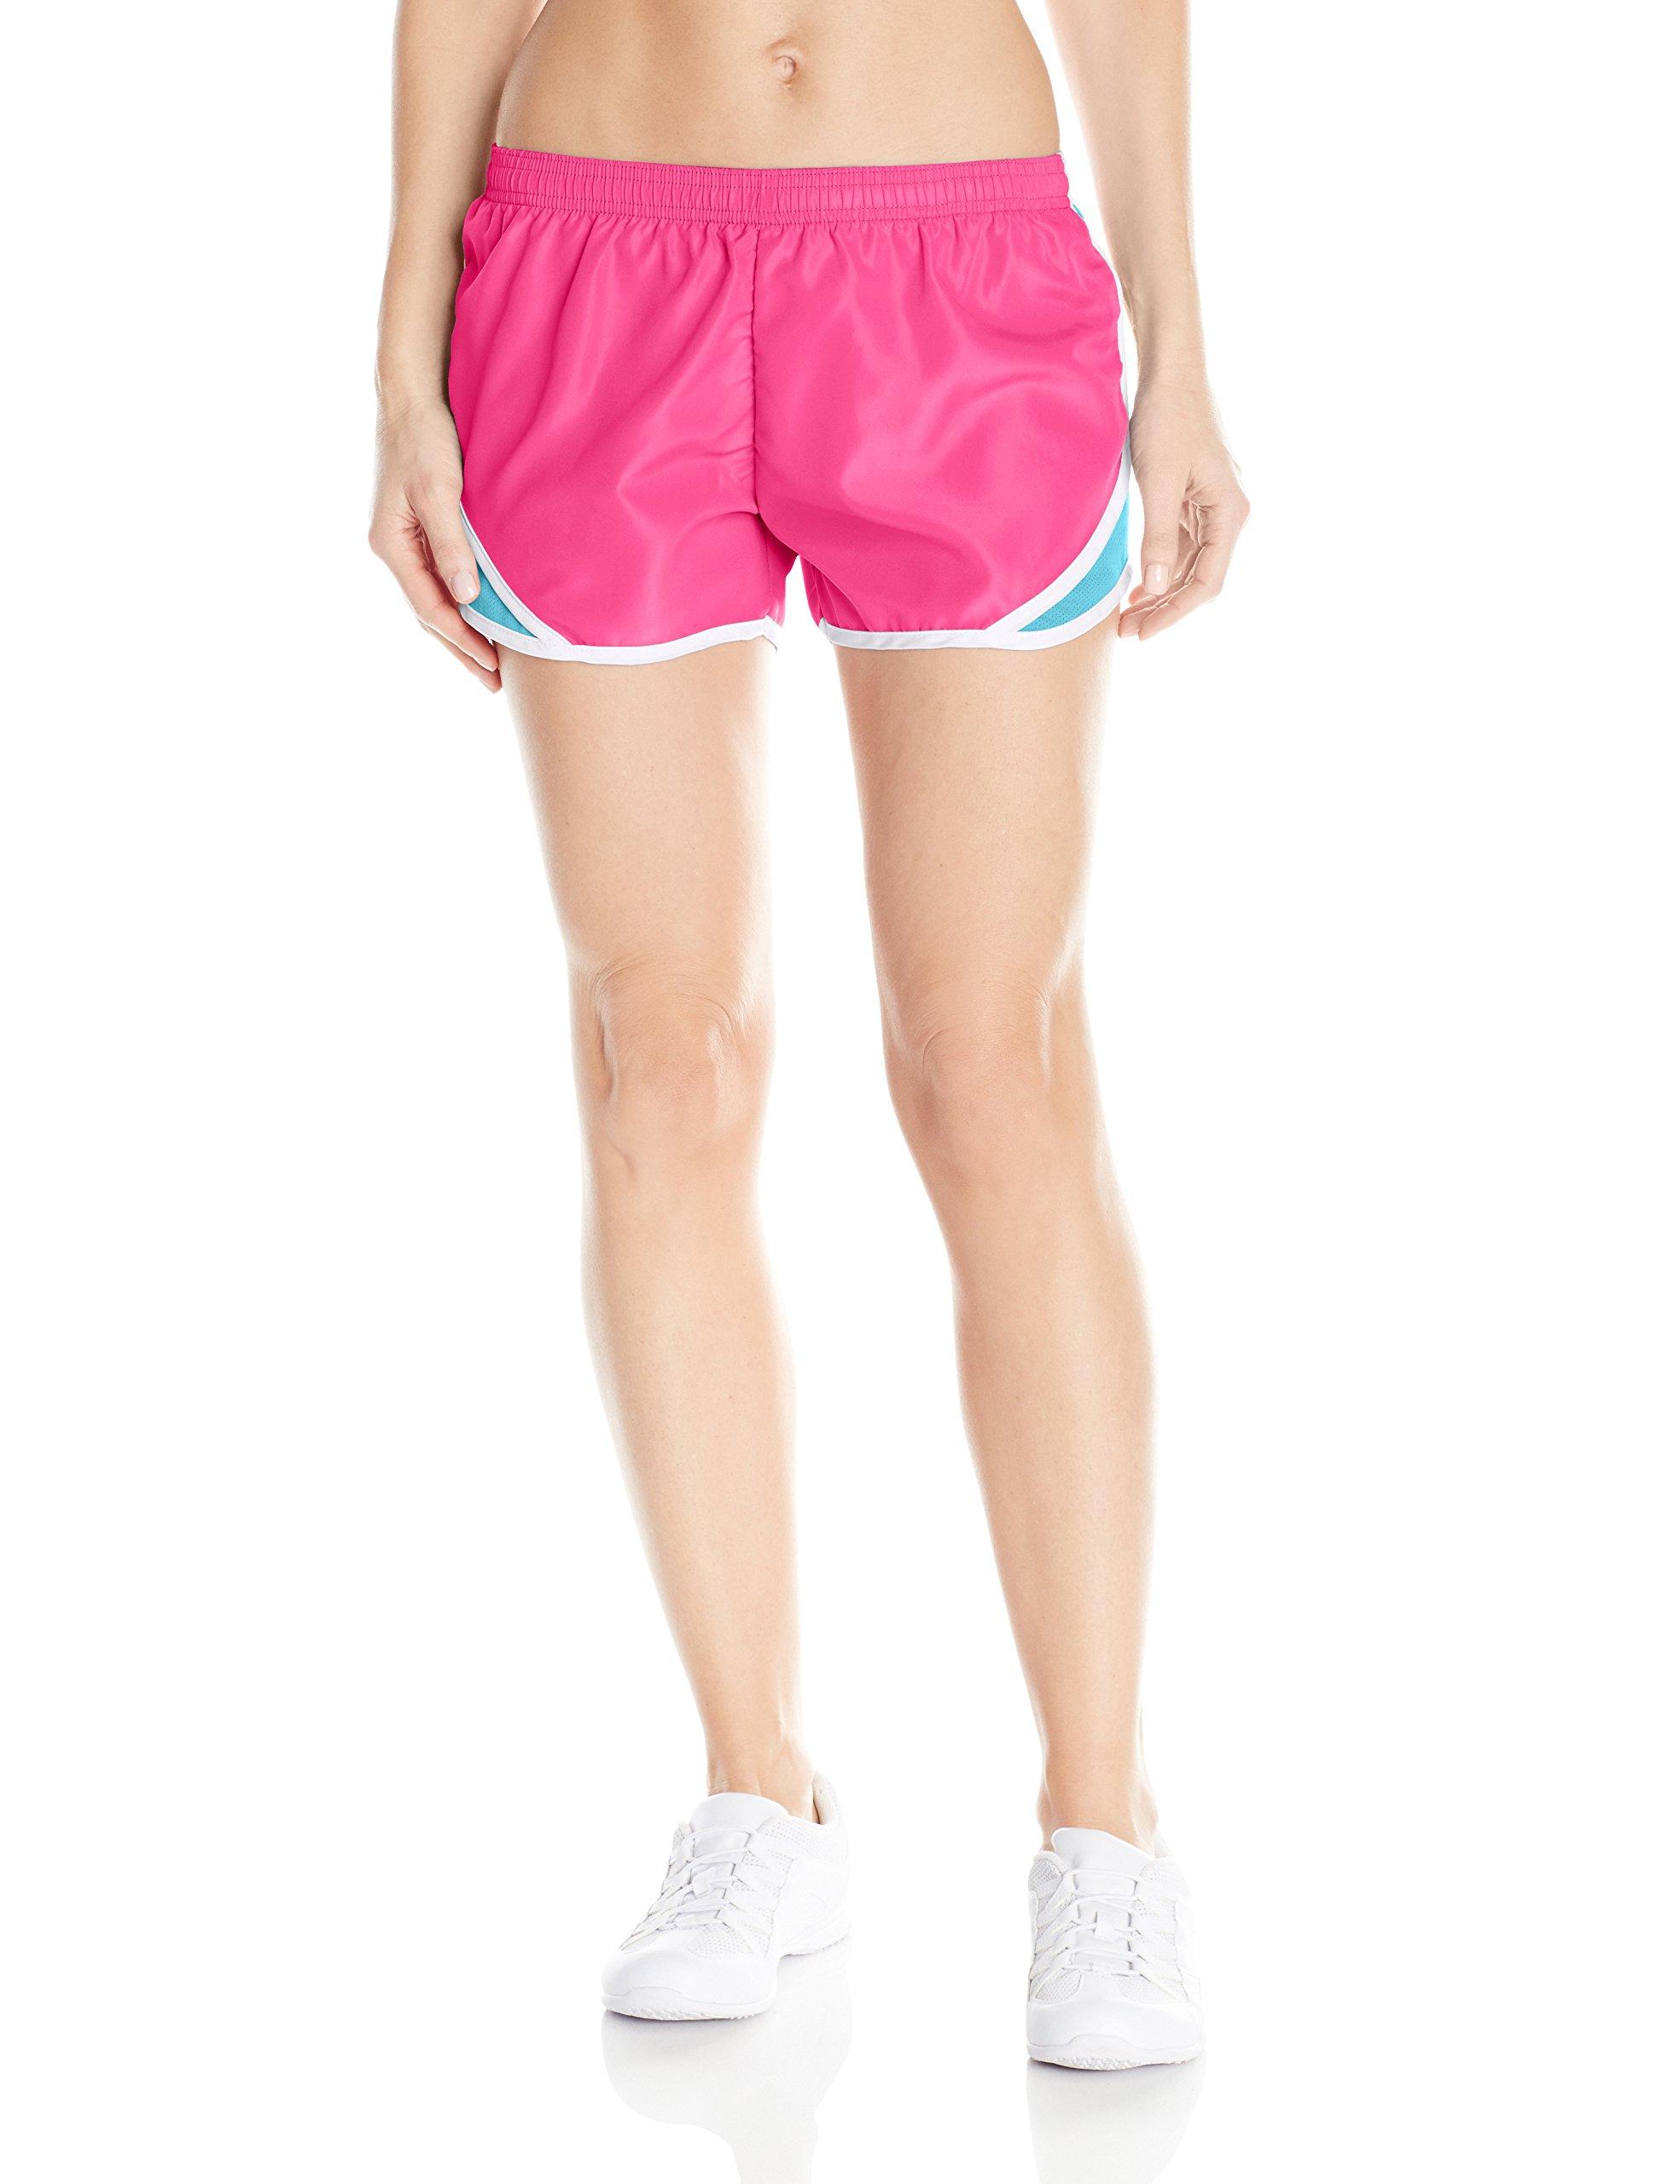 Soffe Women's Juniors' Team Shorty Shorts, Fuchsia Purple/Scuba Blue, Small by Soffe